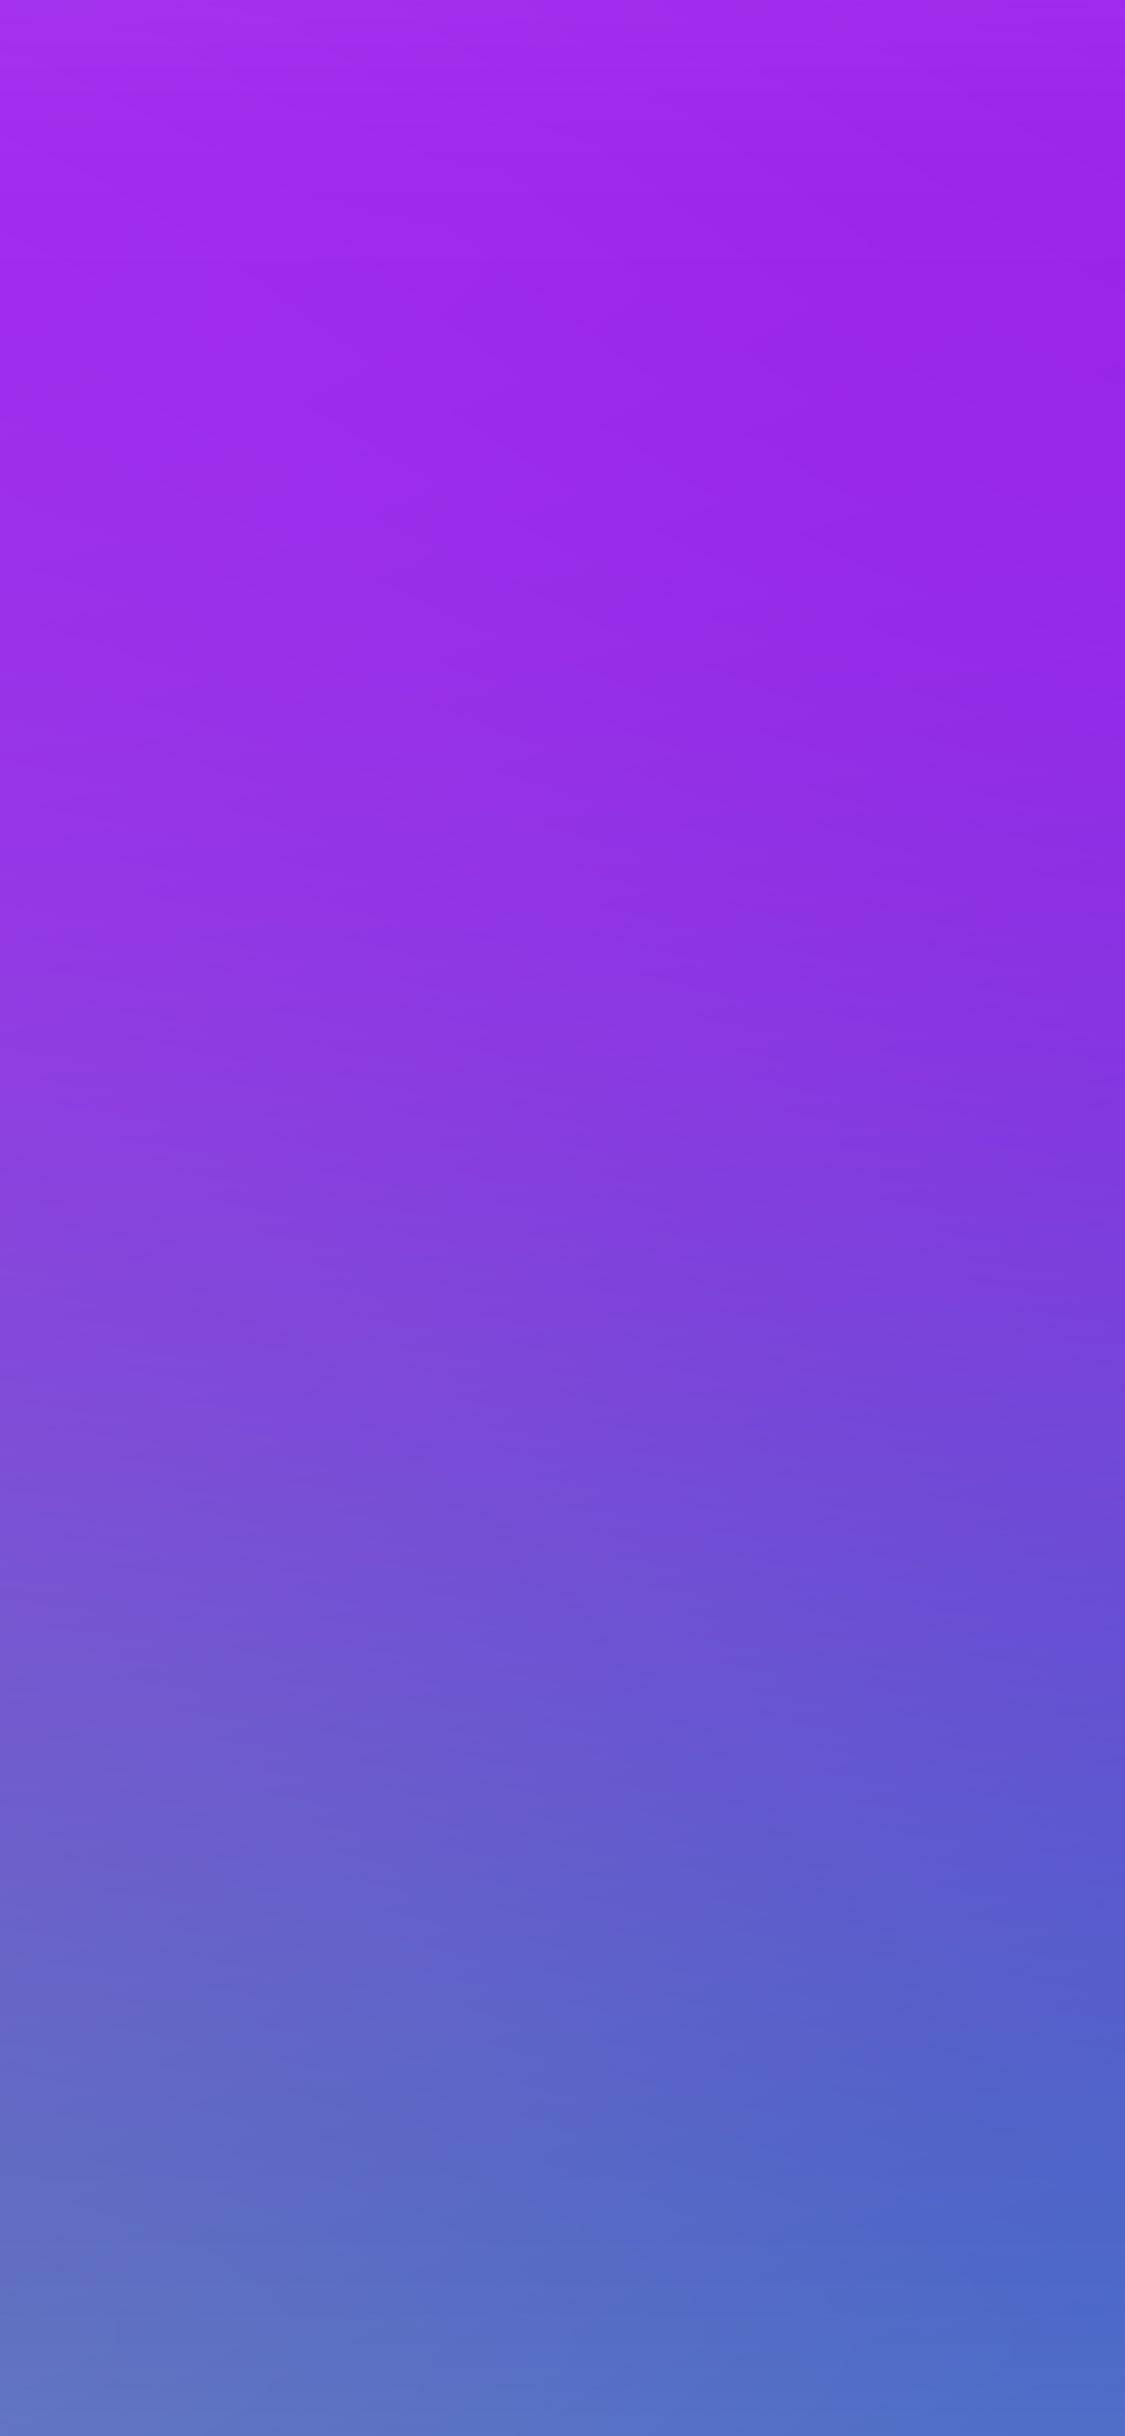 iPhonexpapers.com-Apple-iPhone-wallpaper-sn22-purple-blue-blur-gradation